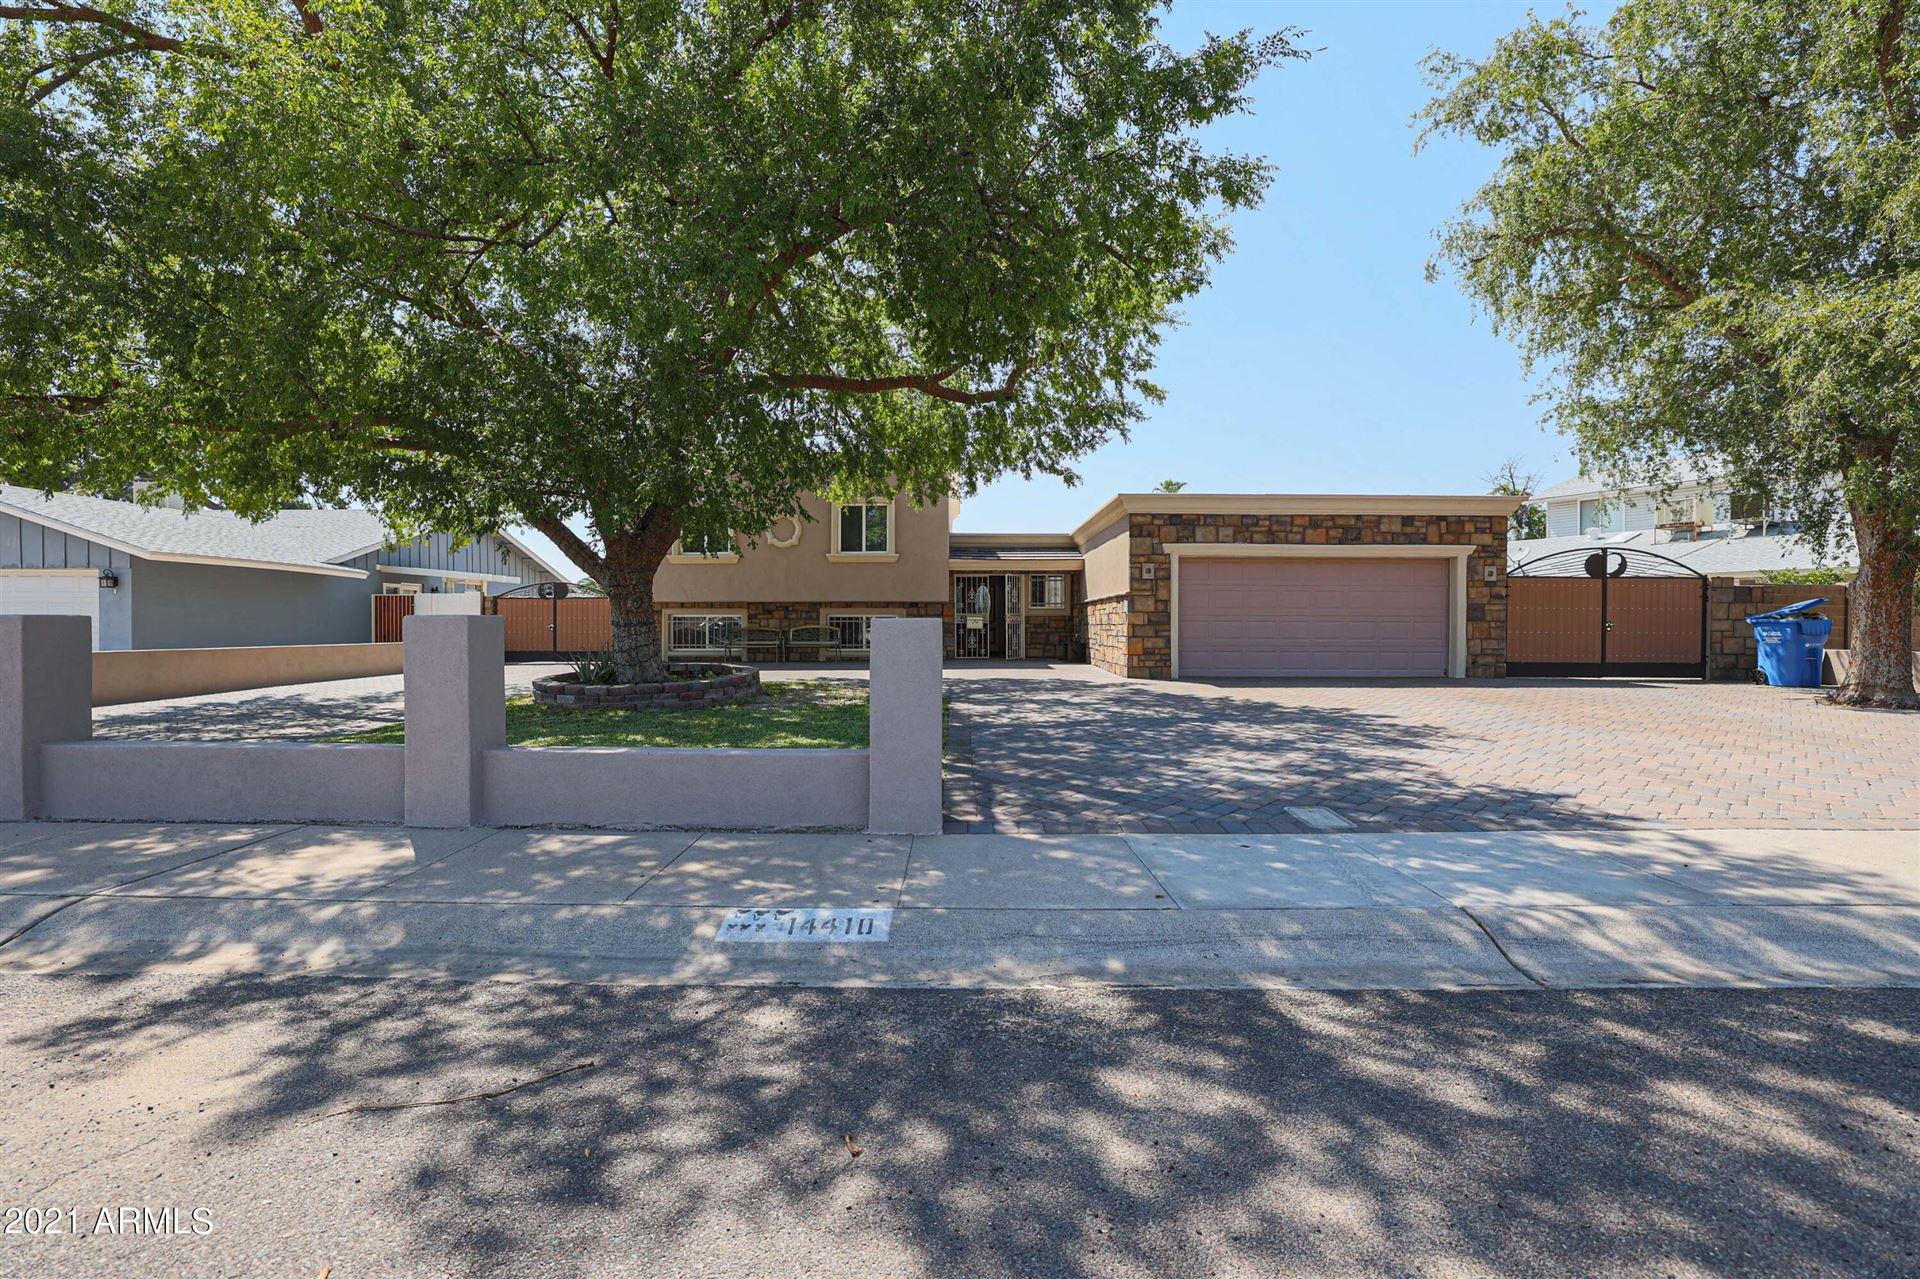 14410 N 33RD Avenue, Phoenix, AZ 85053 - MLS#: 6284319